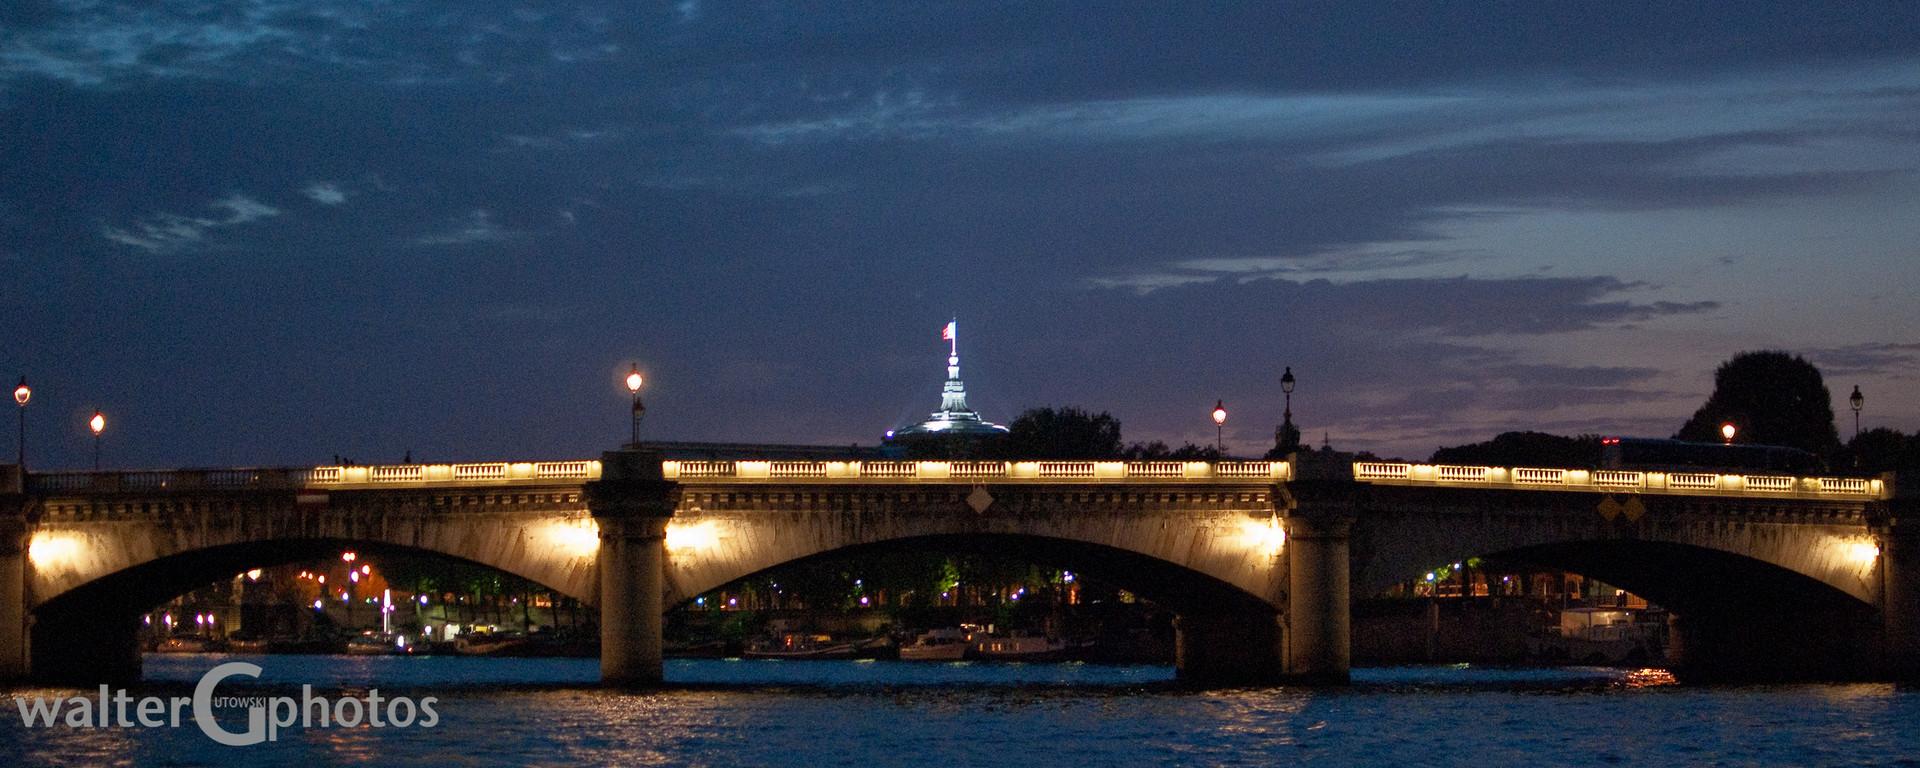 Concorde Bridge, Paris, France